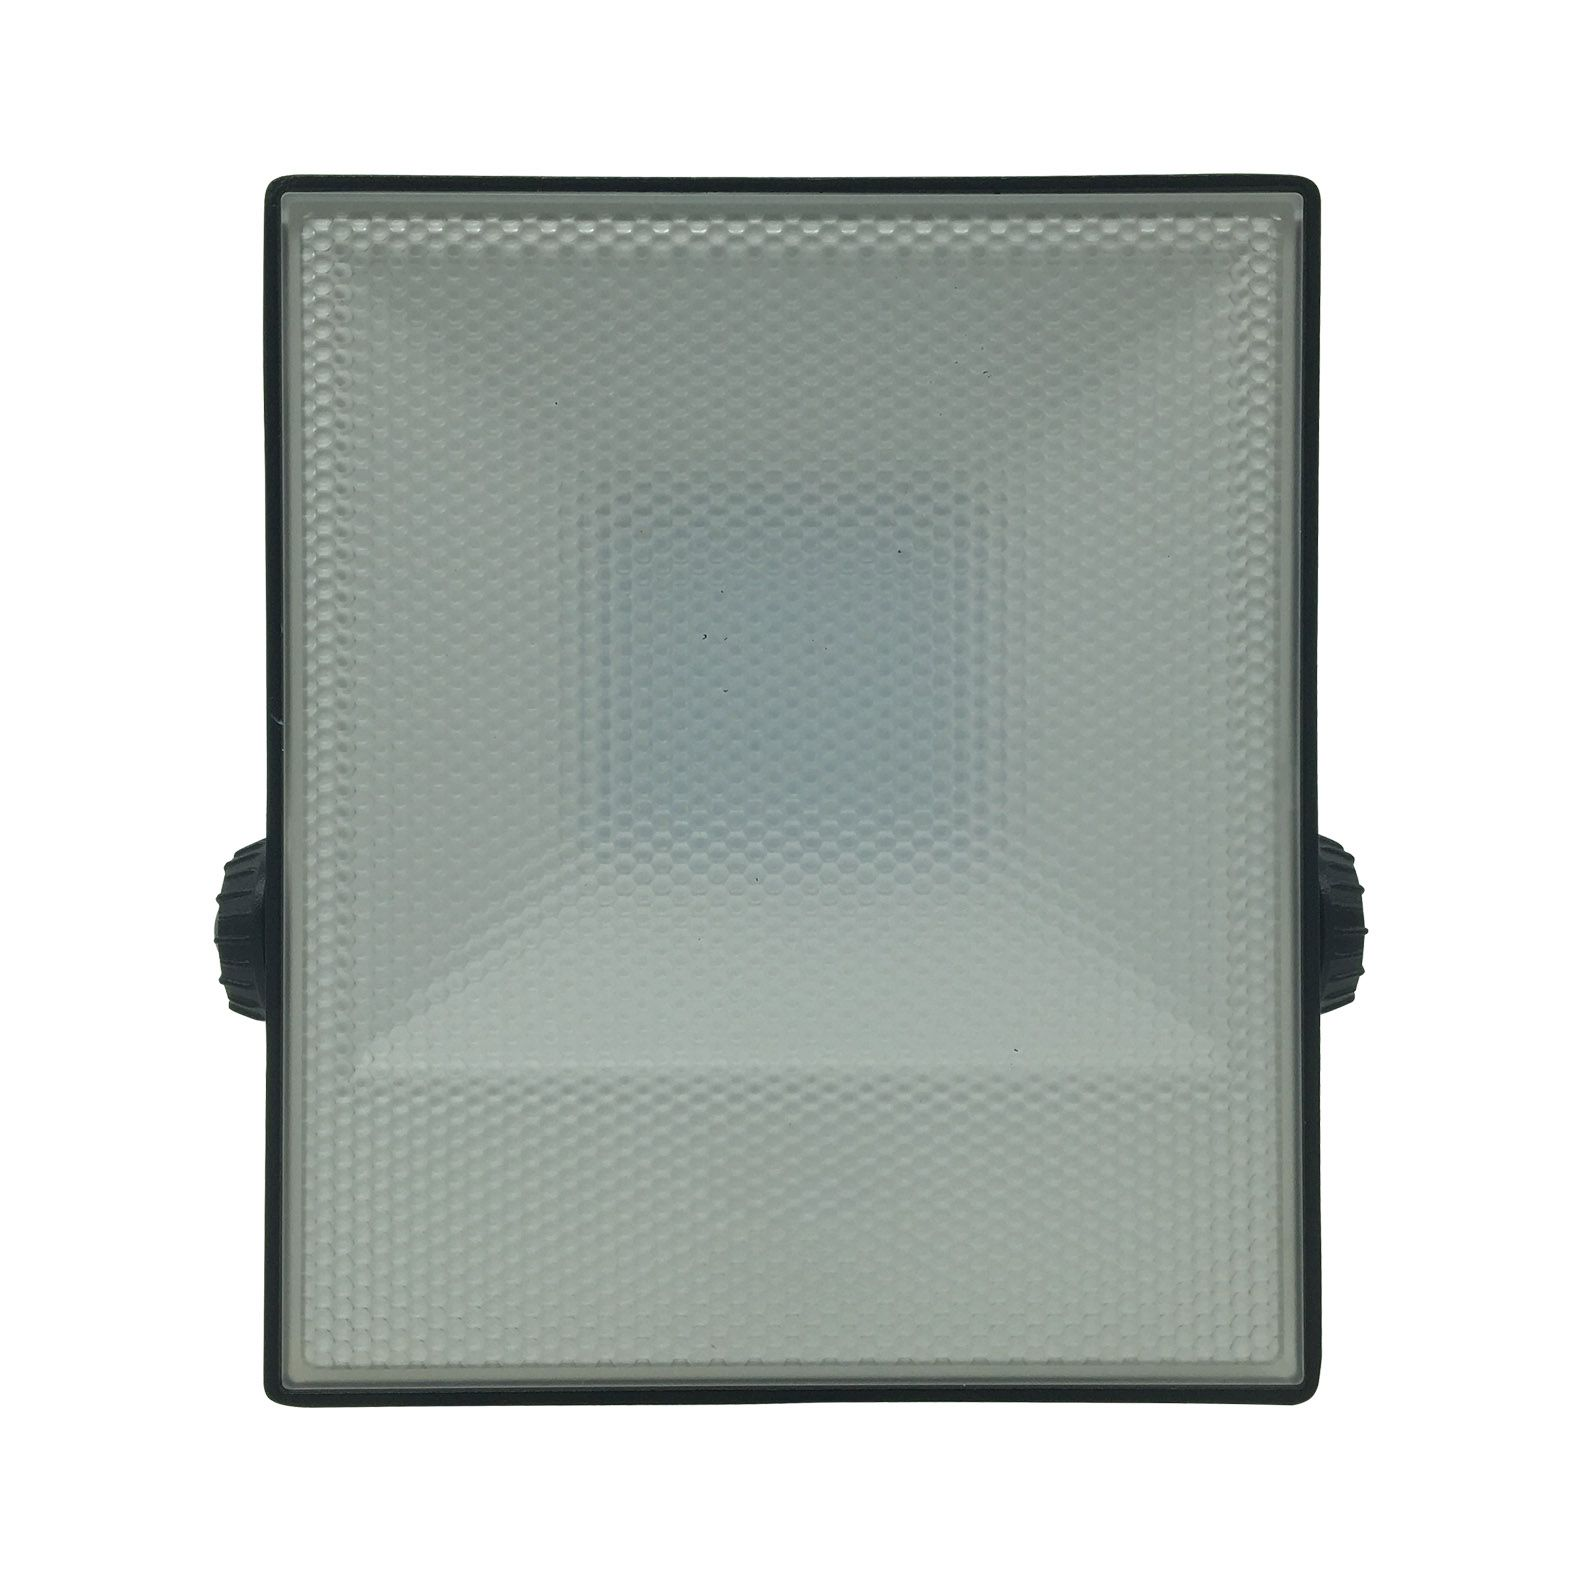 Refletor Preto Super LED Prismático PRO 50W 3000K - (Bivolt)